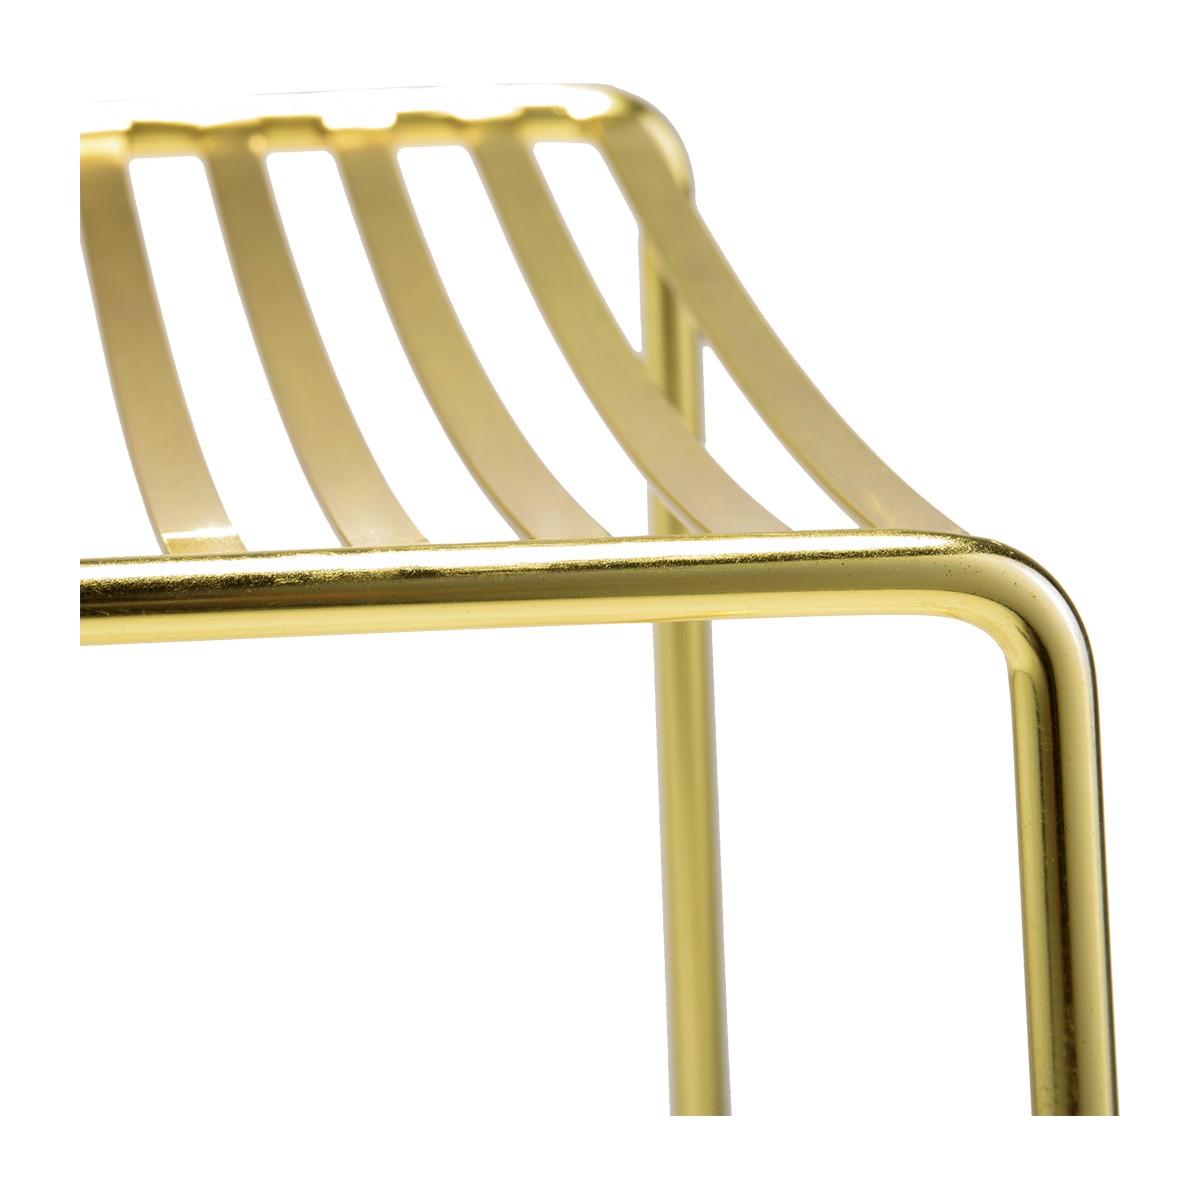 Wire Stool Gold Black Label : xbs jim stud gold 3jpgpagespeedicaOpj1uaBn  from www.blacklabelevents.com.au size 1200 x 1200 jpeg 82kB